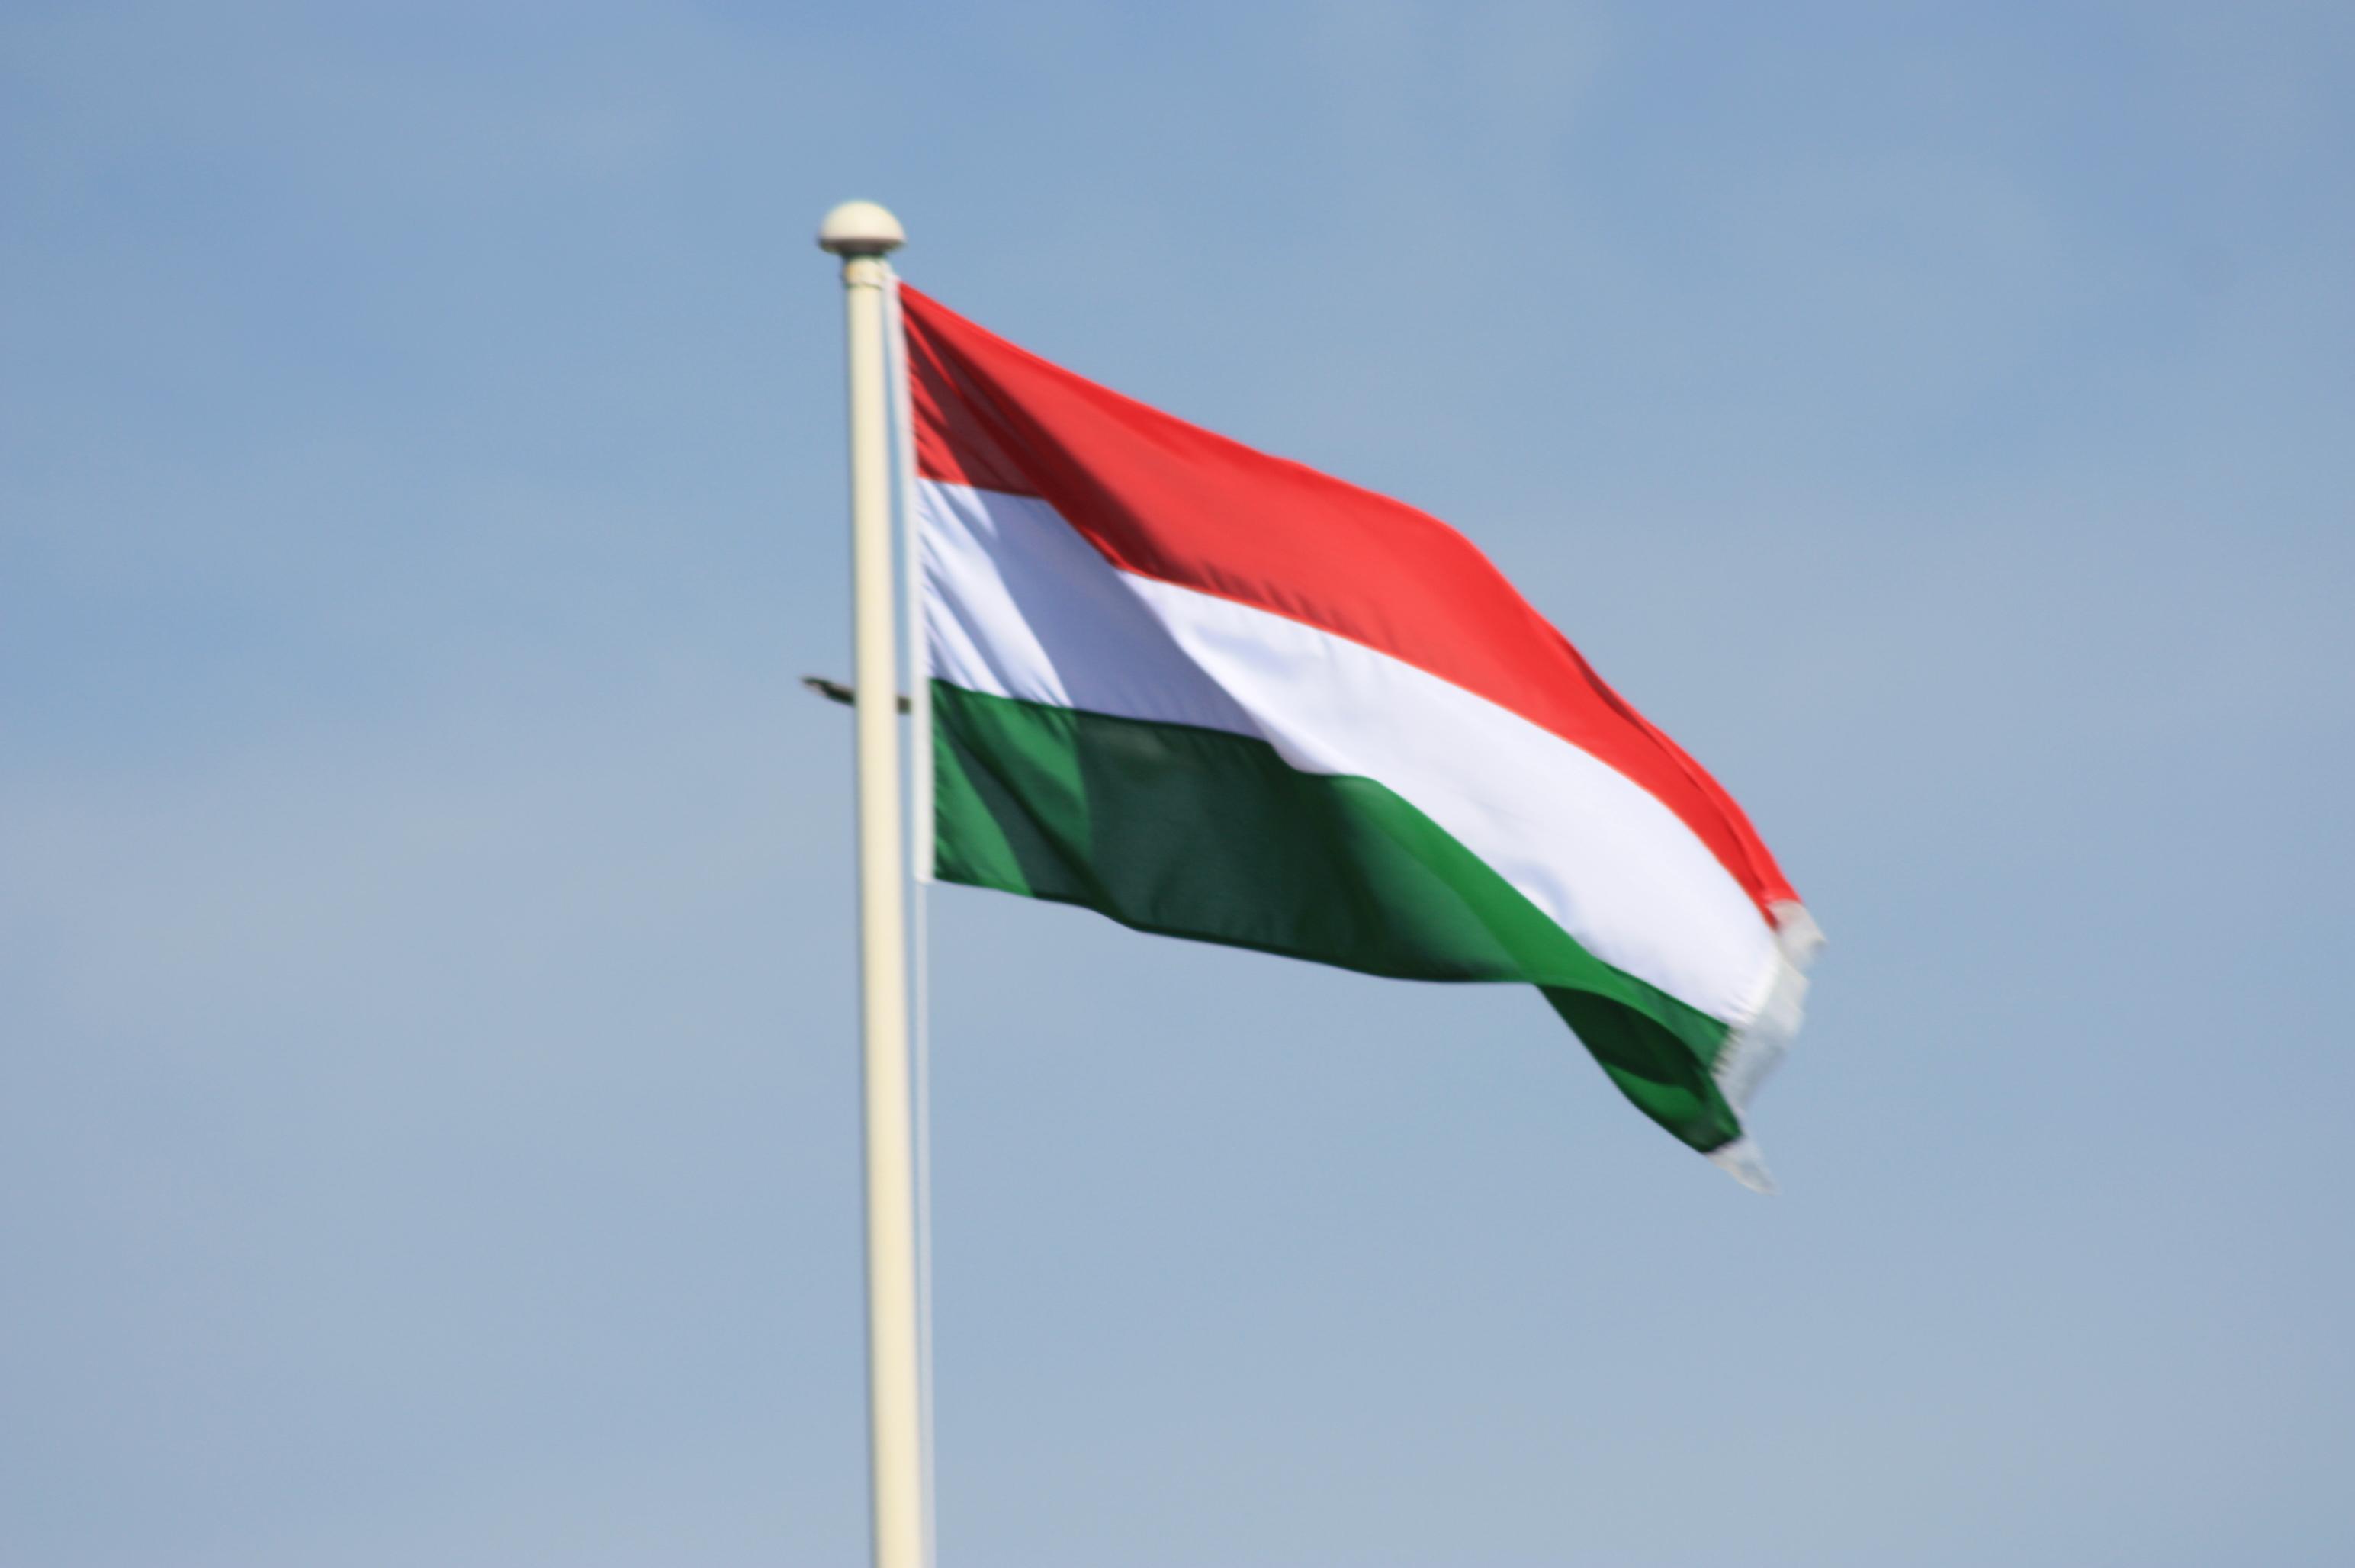 Hungarian_flag.jpg